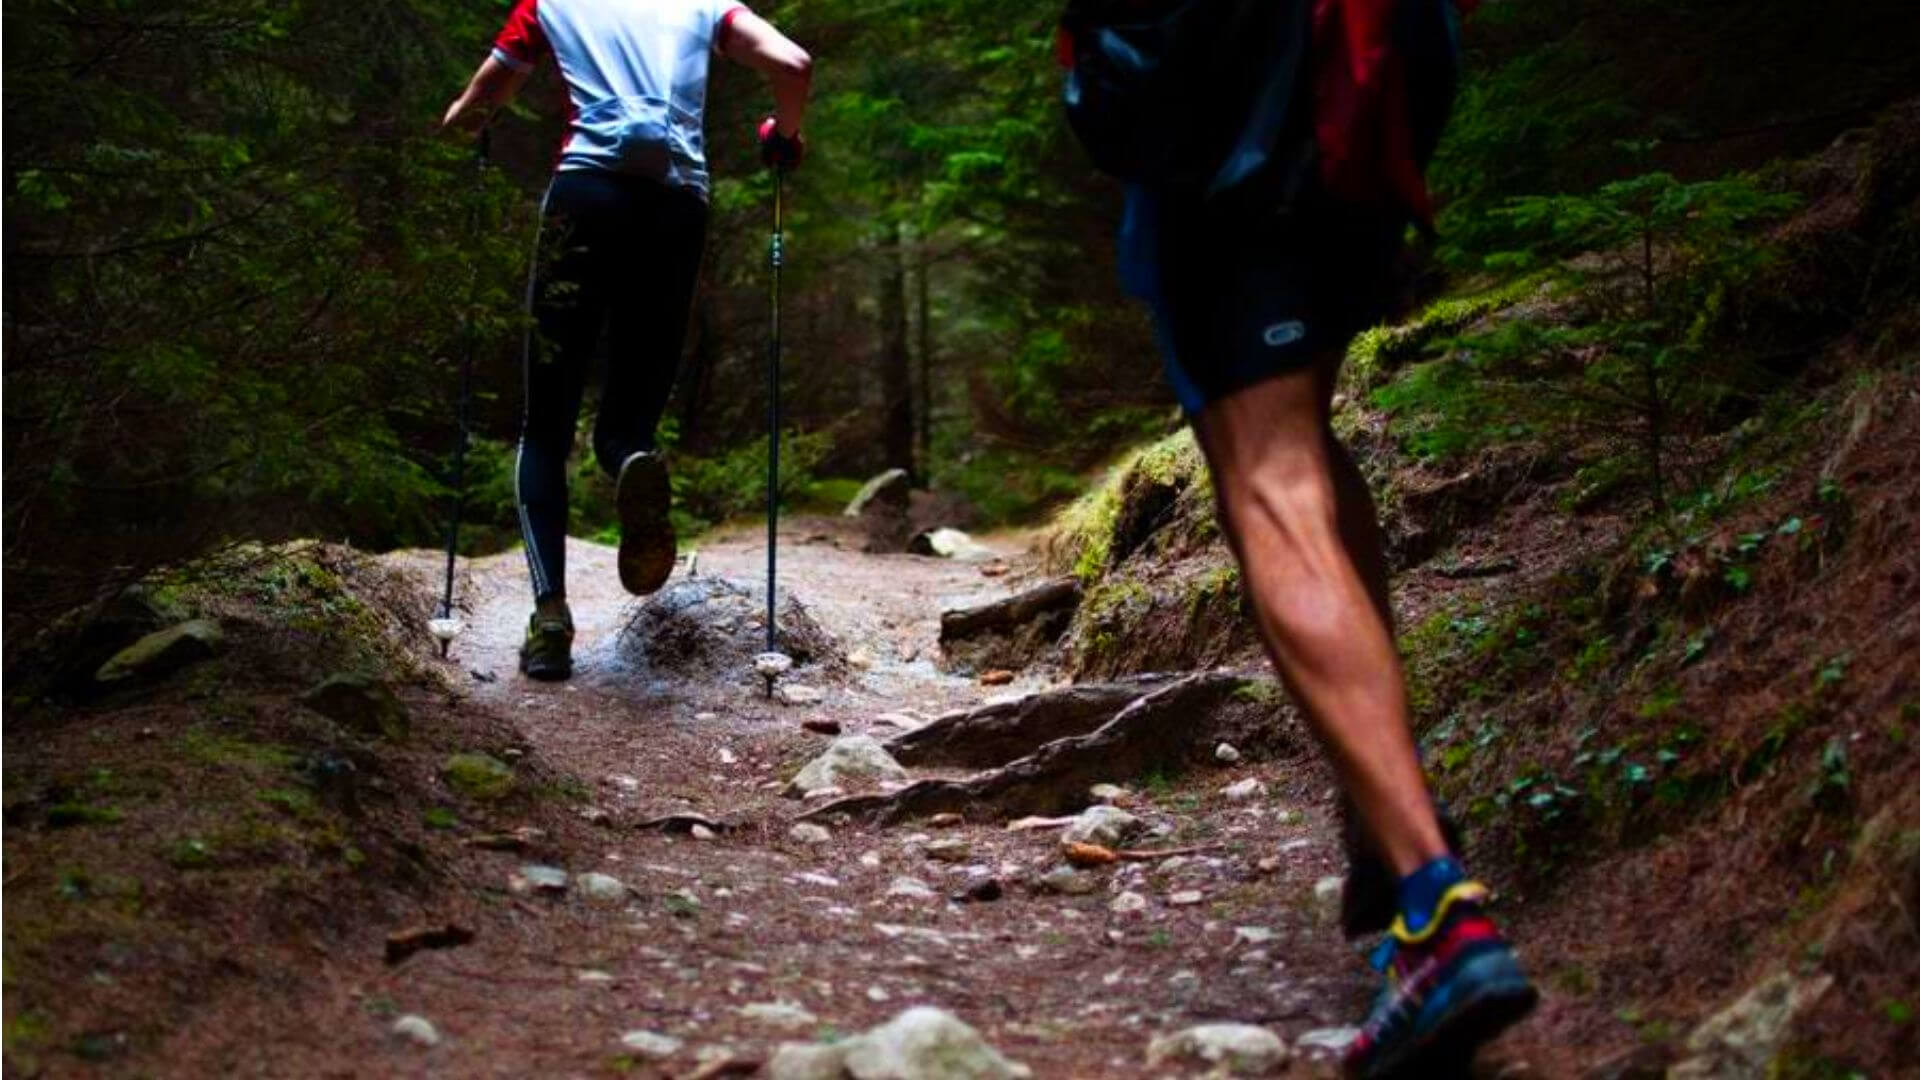 corredores-practicando-trail-running